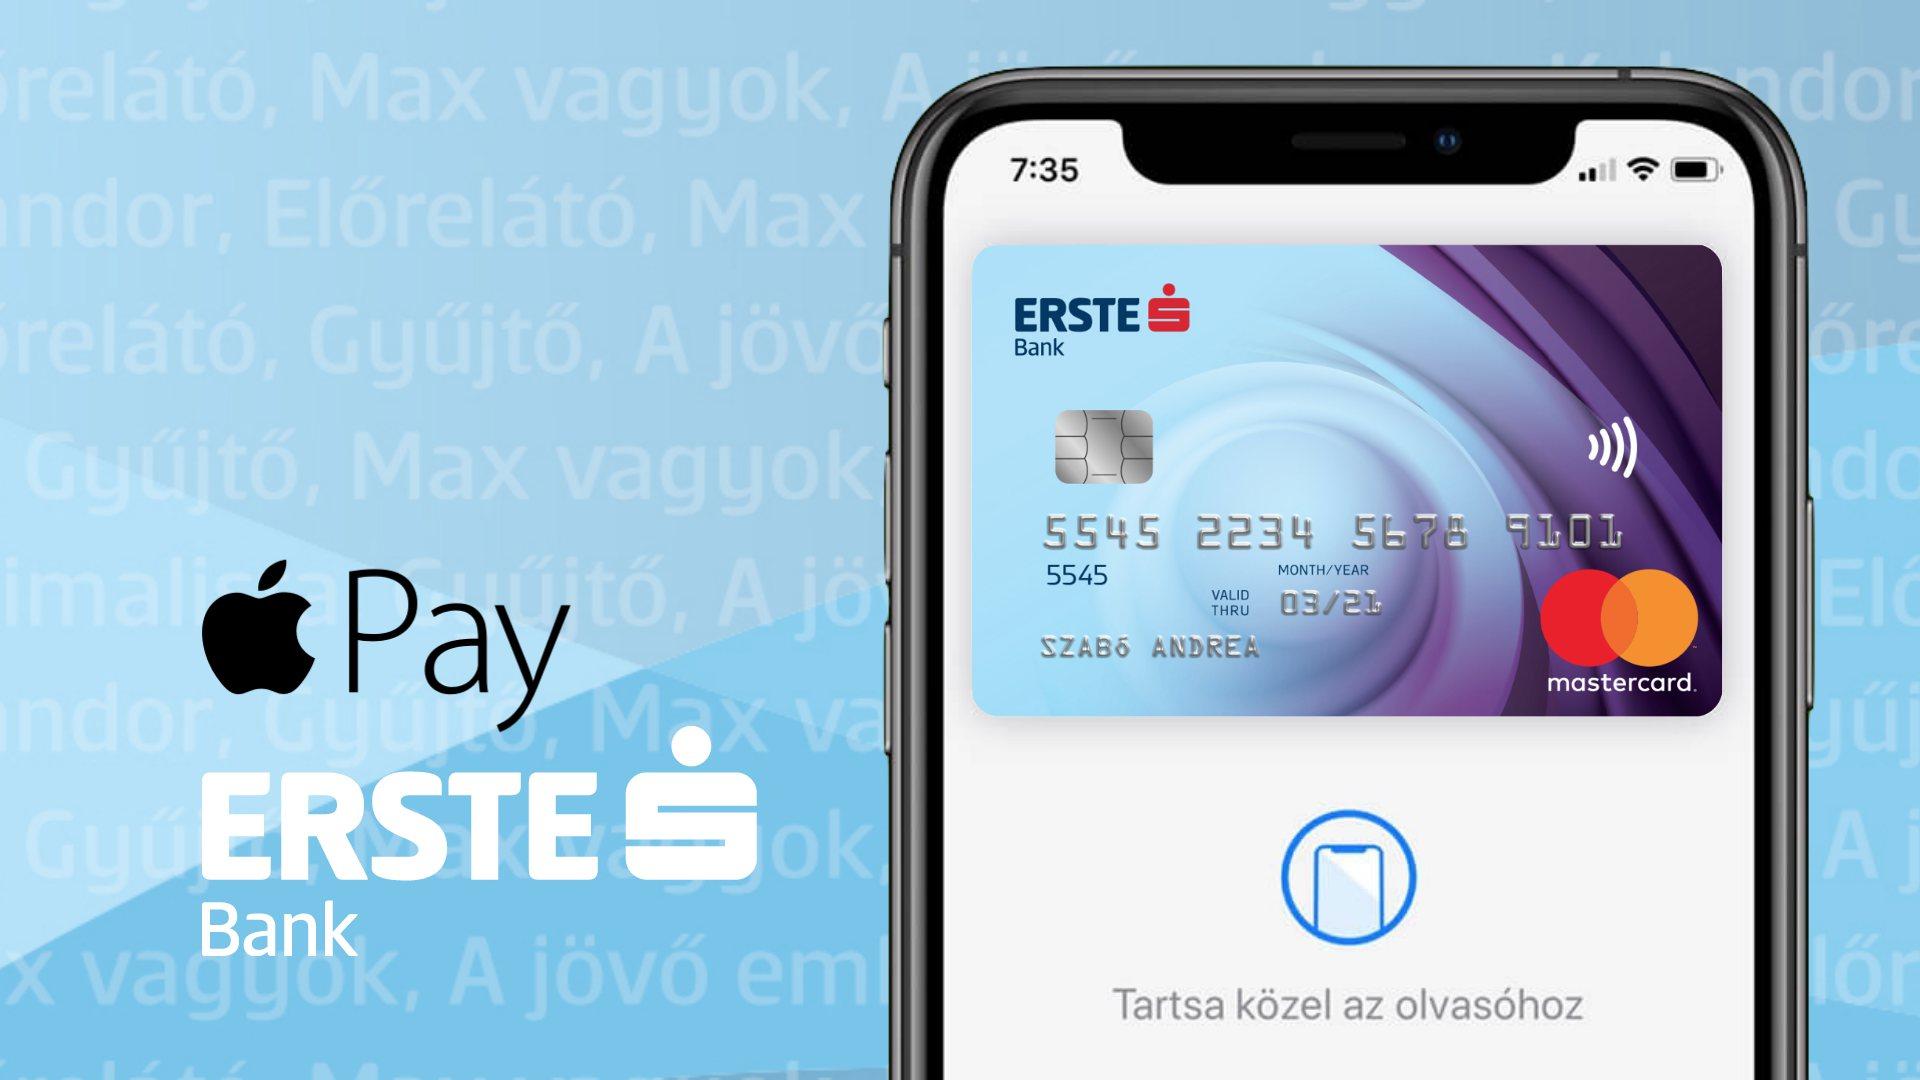 Erste apple pay mobilfizetes paytechshow